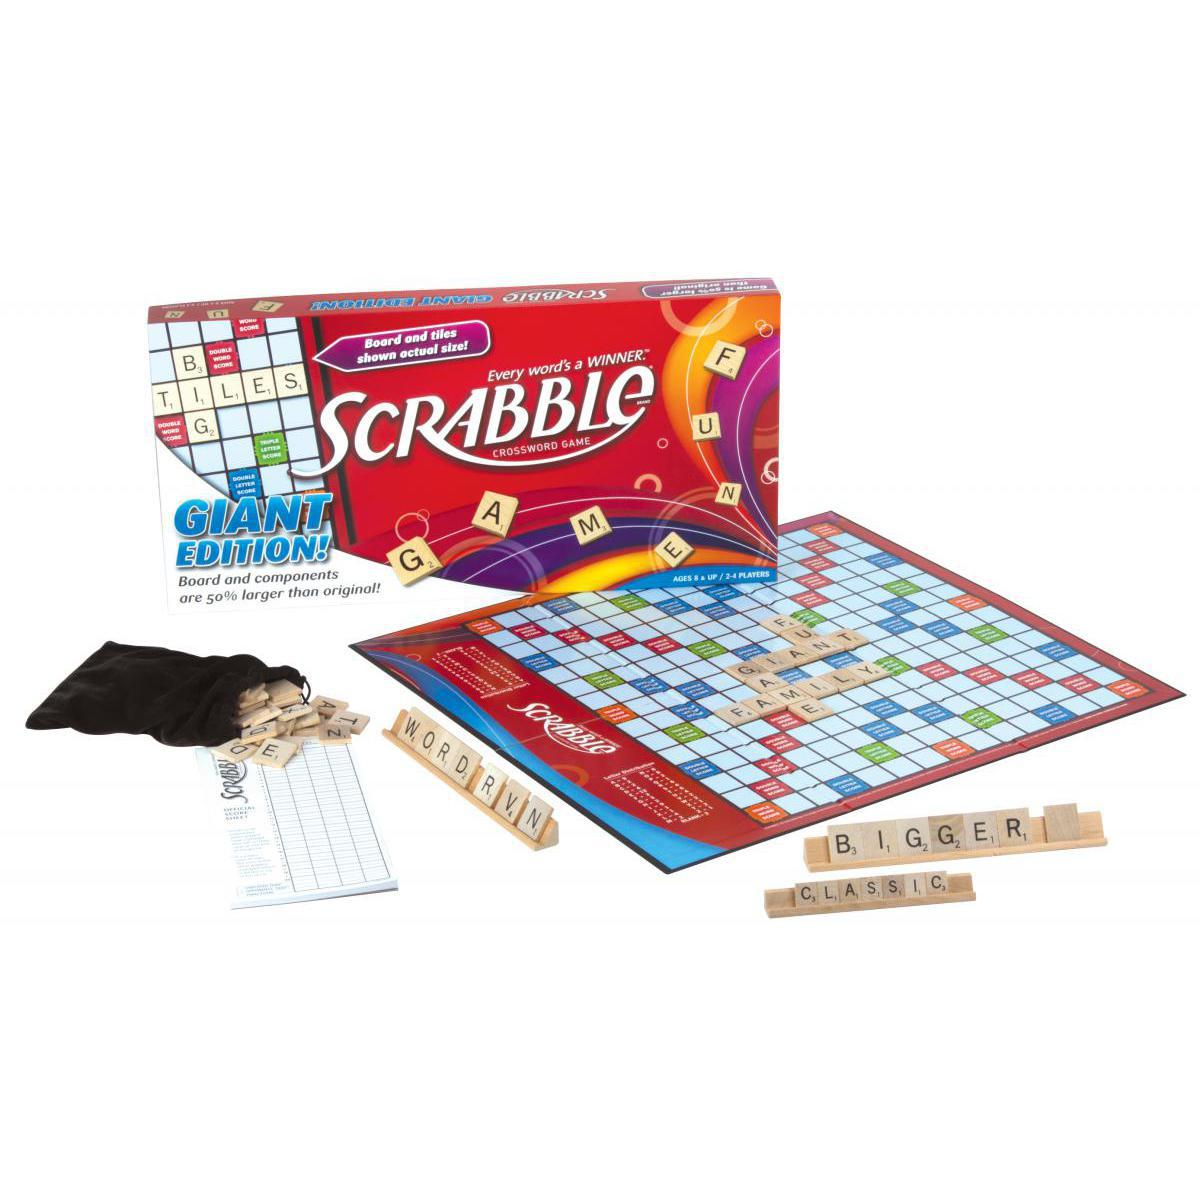 Giant Scrabble®